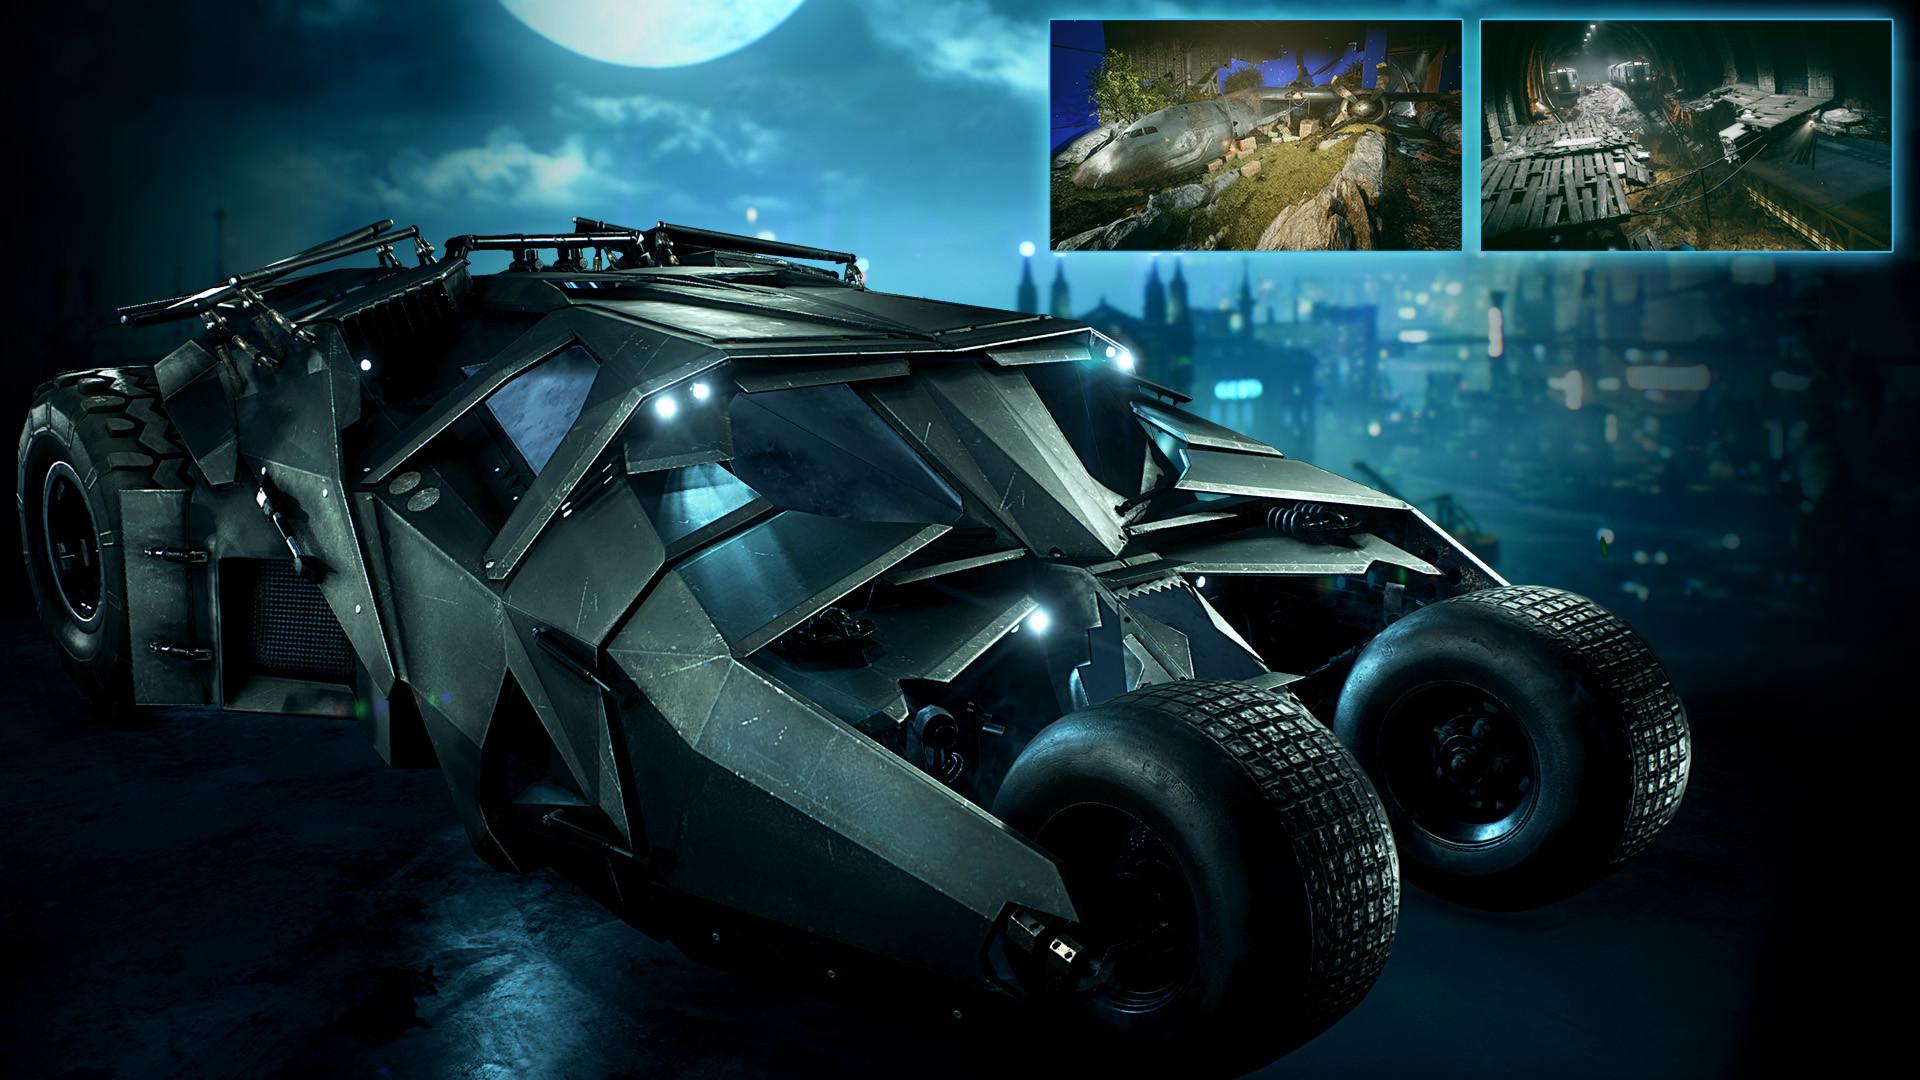 September Batman: Arkham Knight DLC includes The Dark